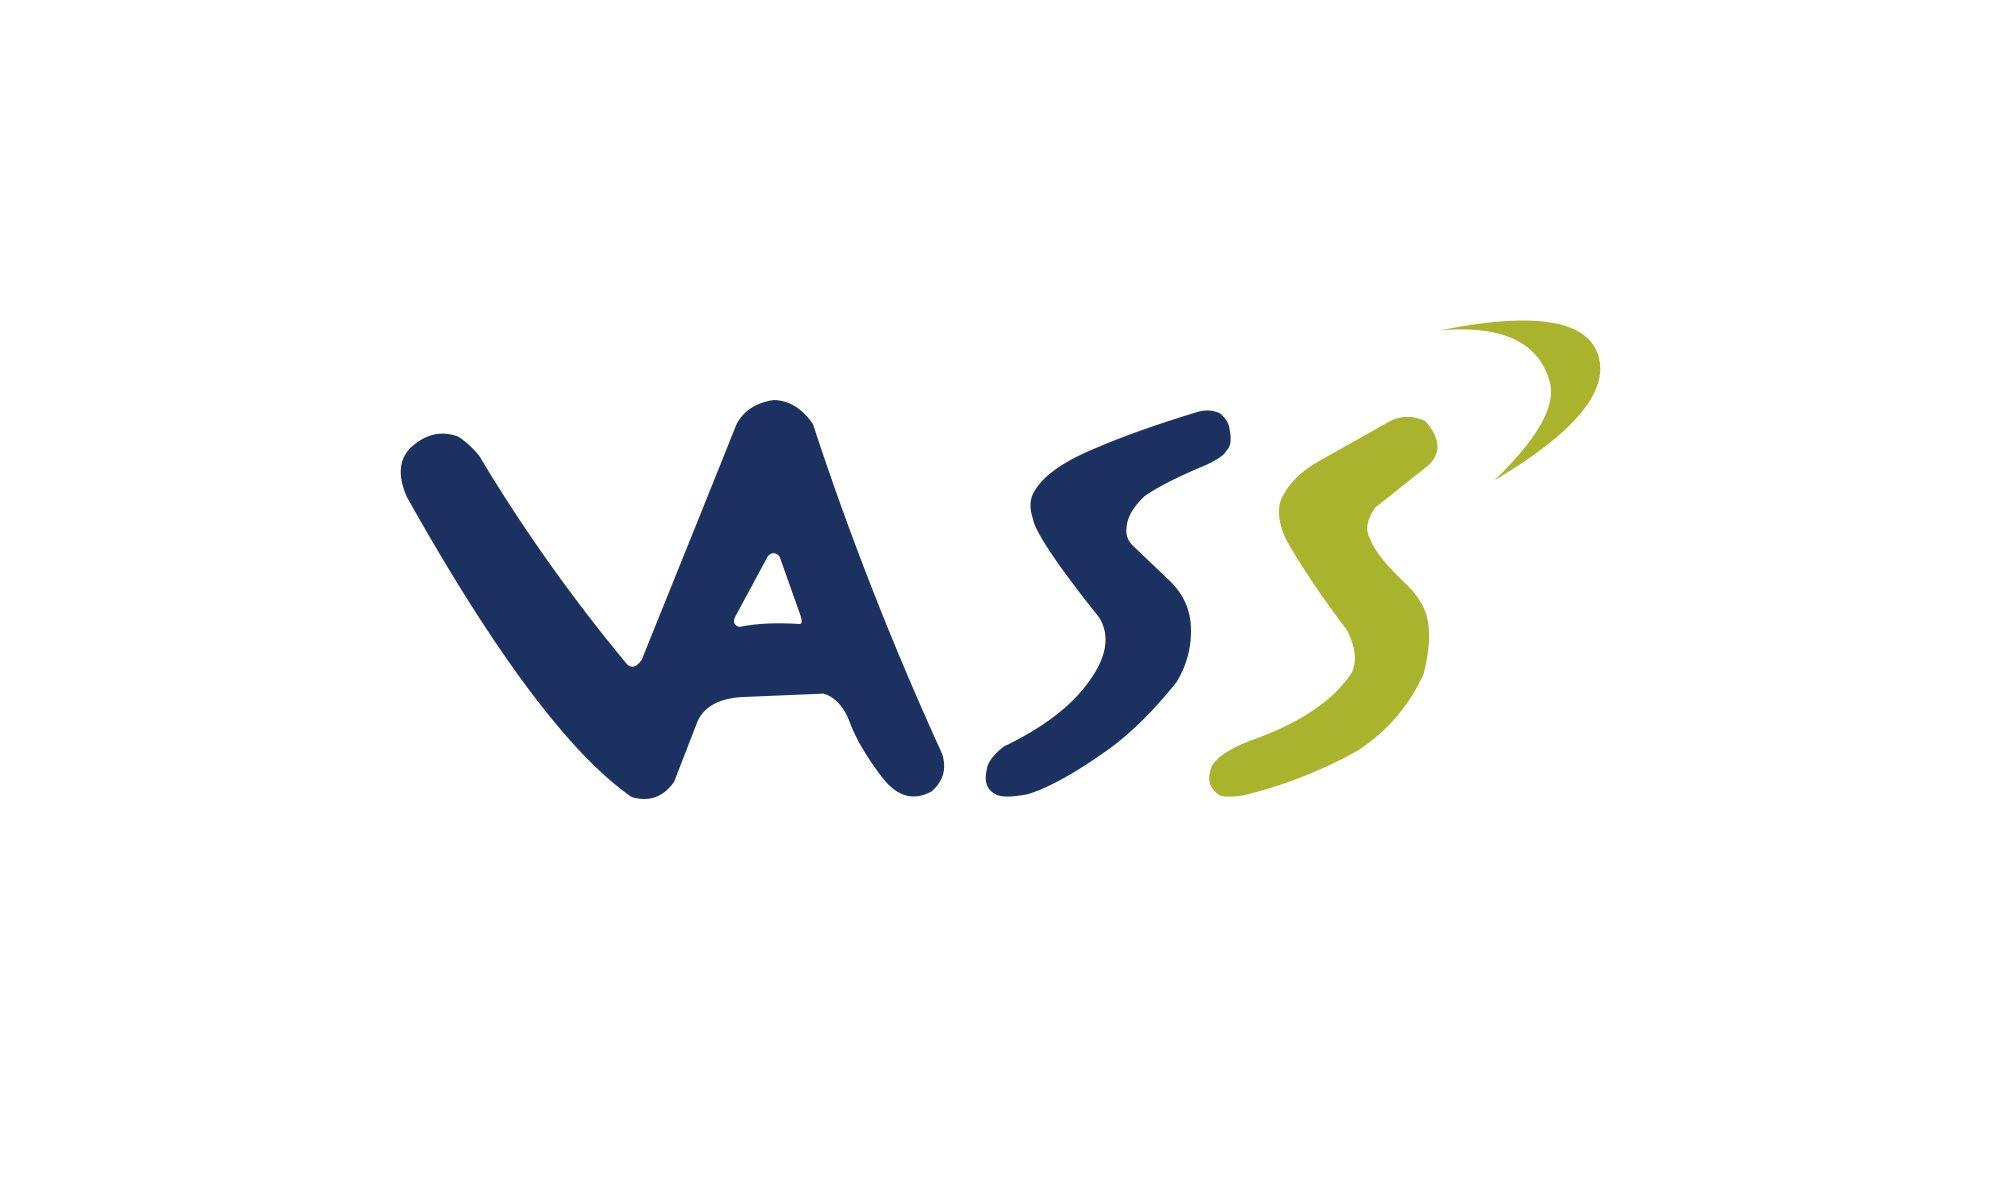 VASS Chile